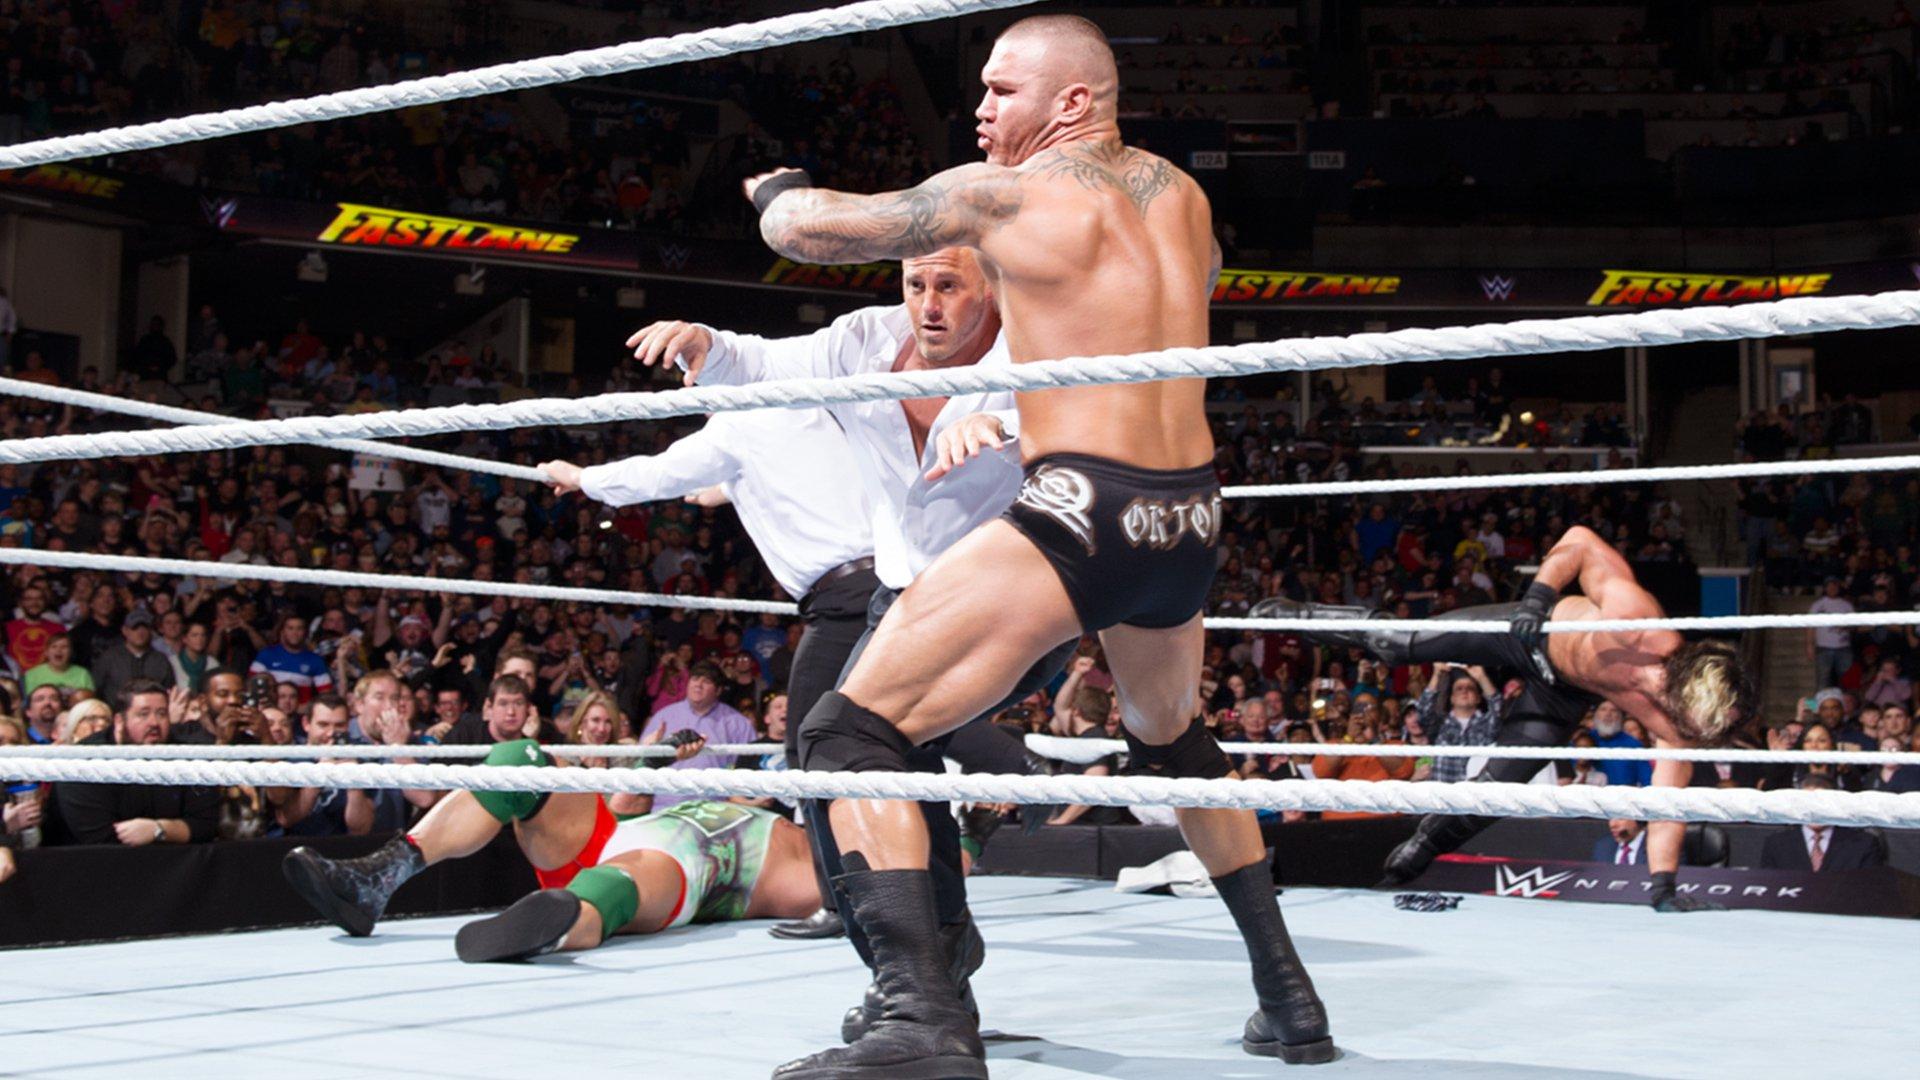 Randy Orton returns to RKO The Authority: WWE Fastlane 2015